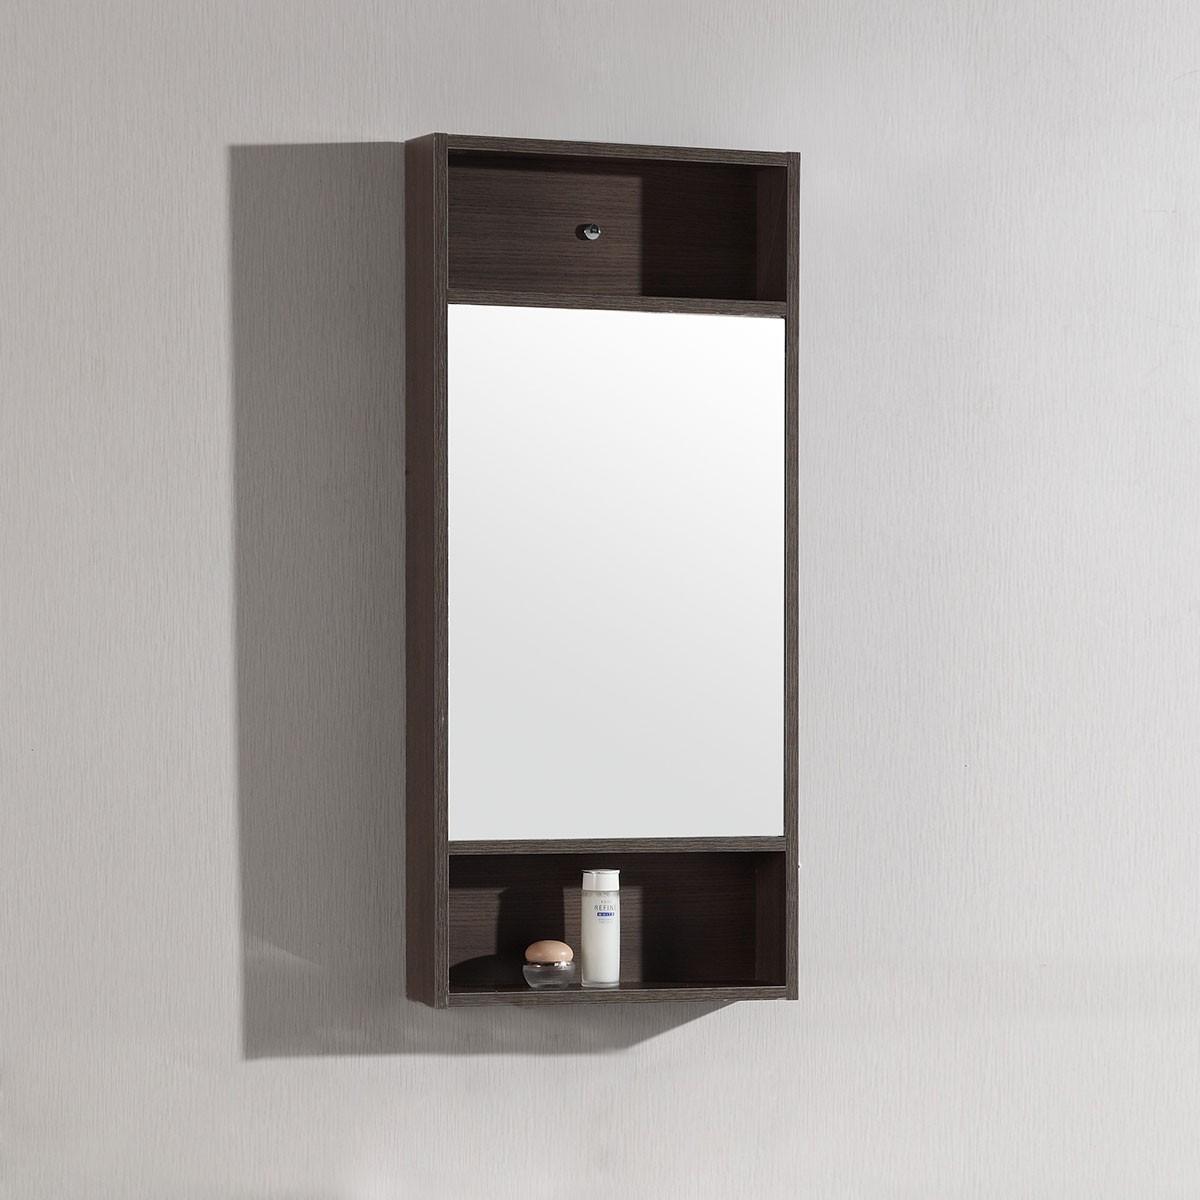 18 x 28 po Miroir avec cadre brun (DK-TH20160A-M)